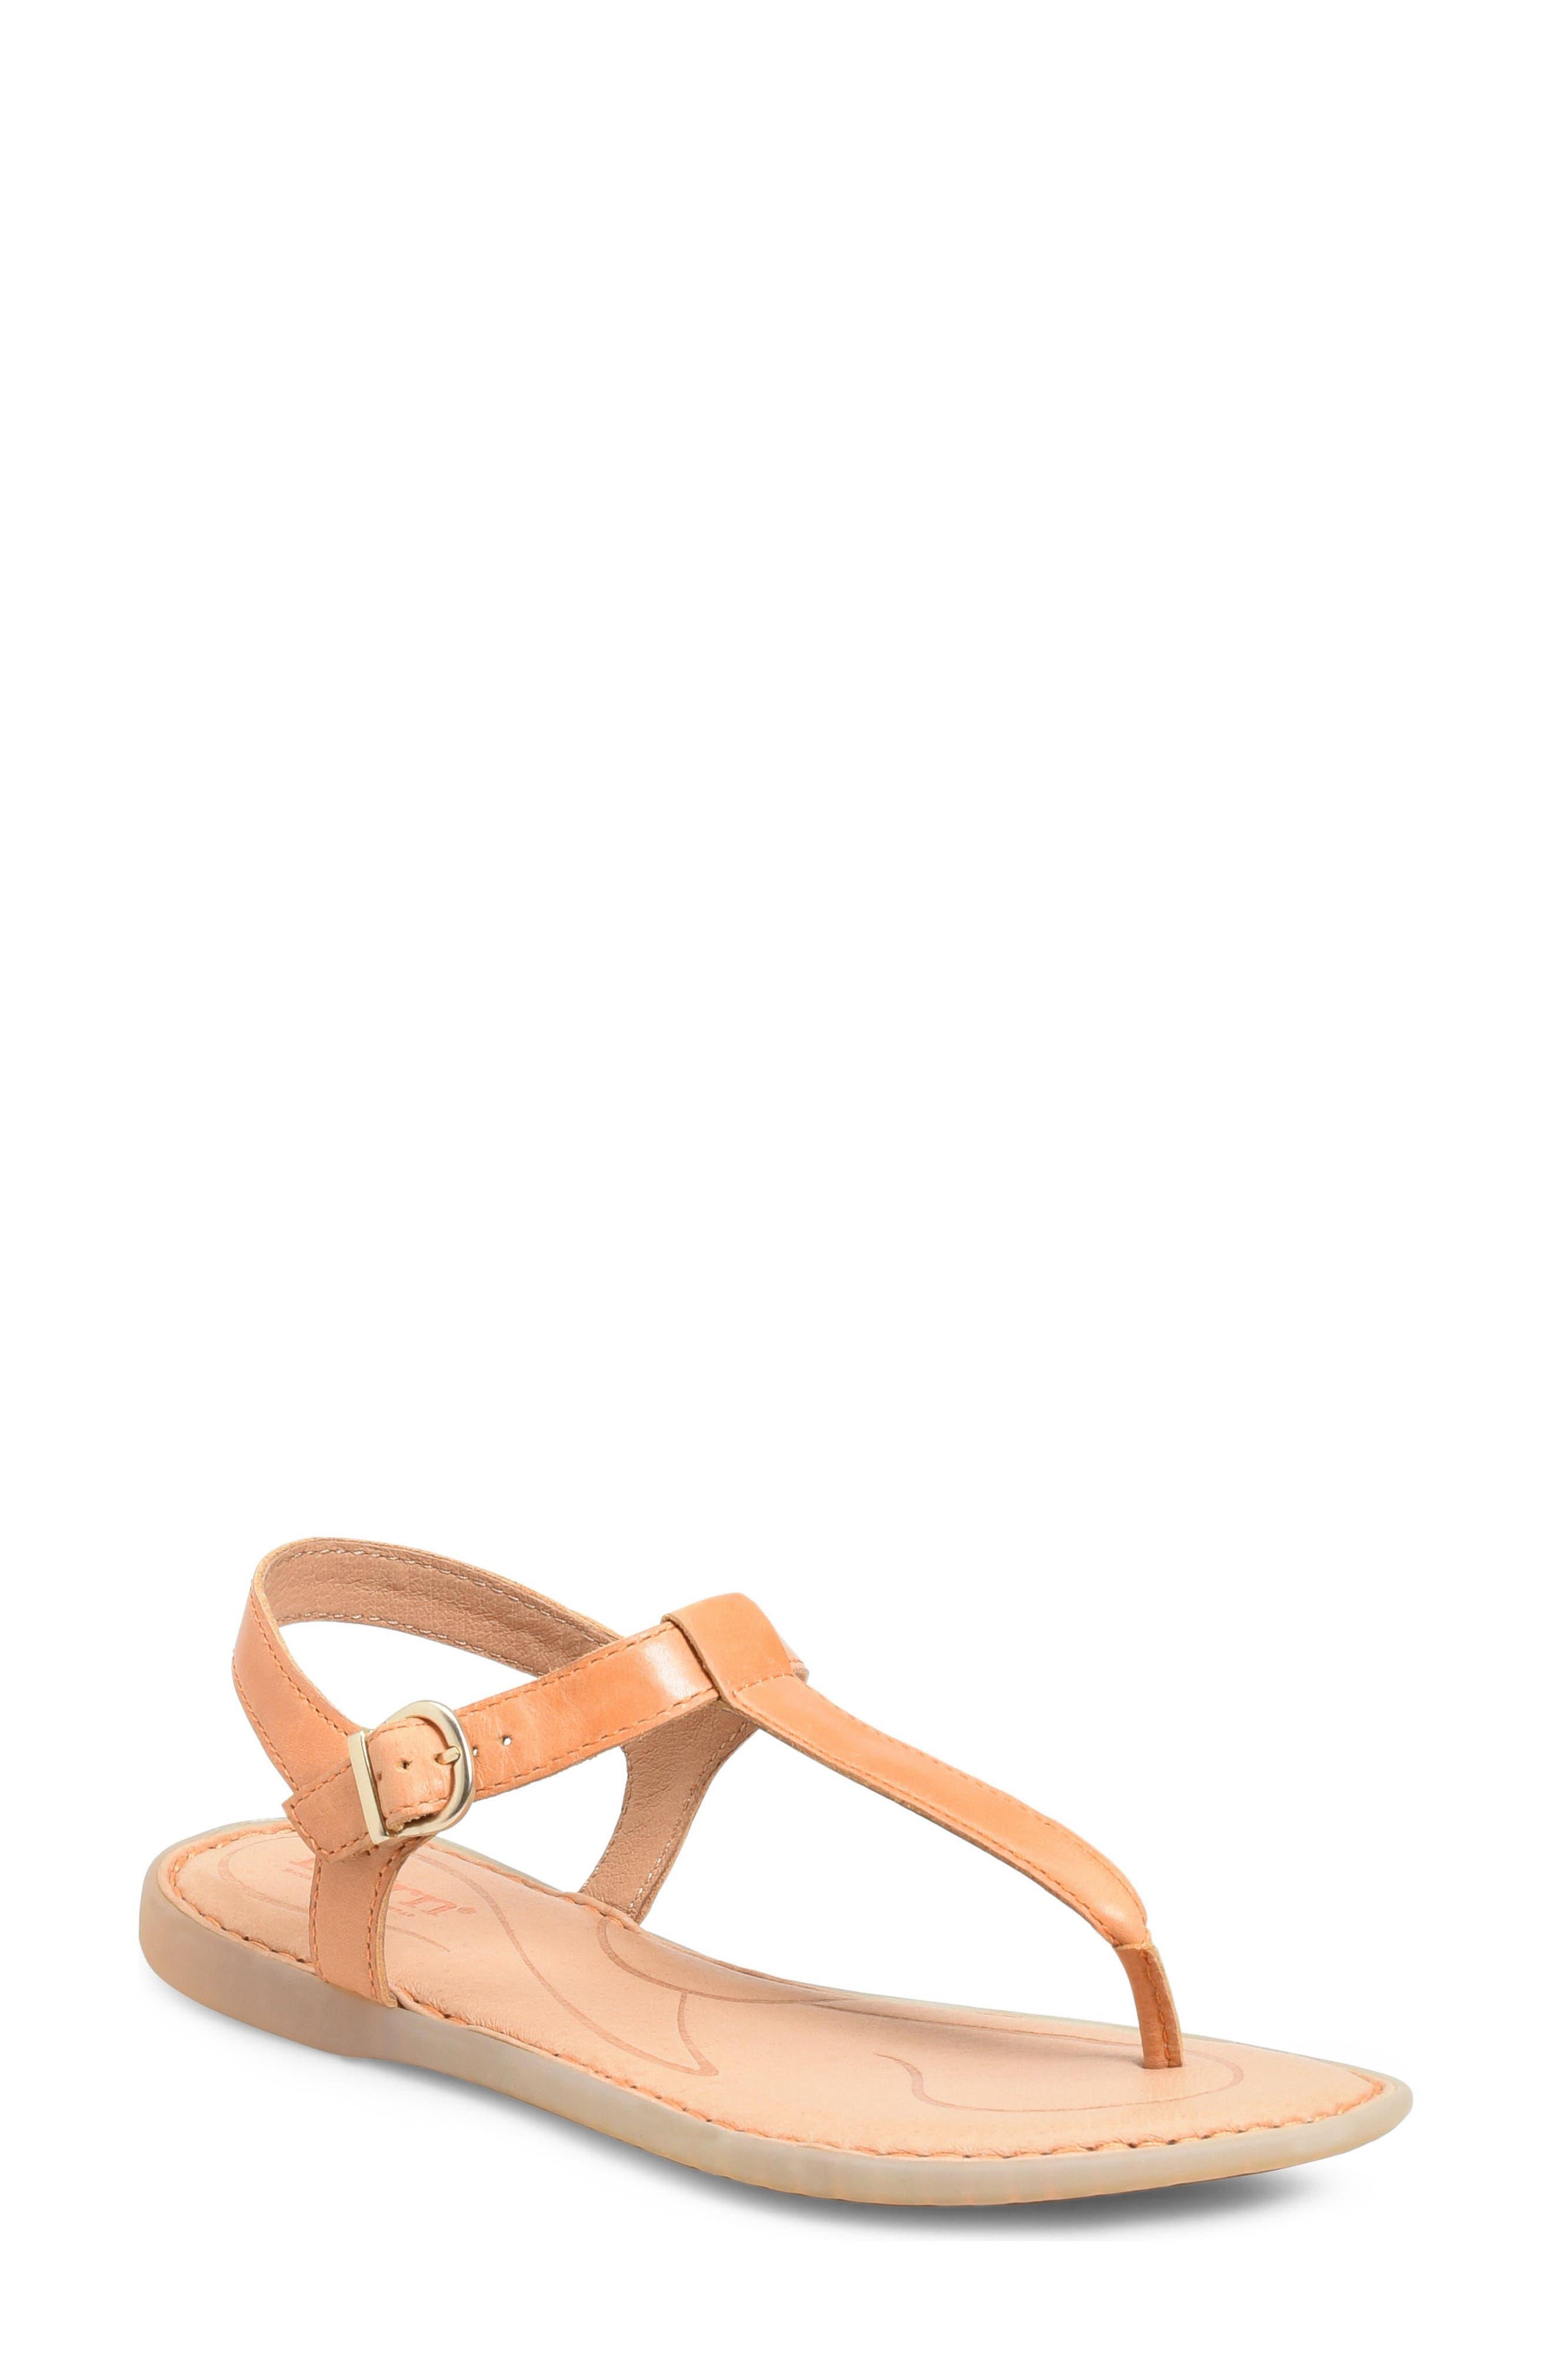 Alternate Image 1 Selected - Børn Aswan Sandal (Women)